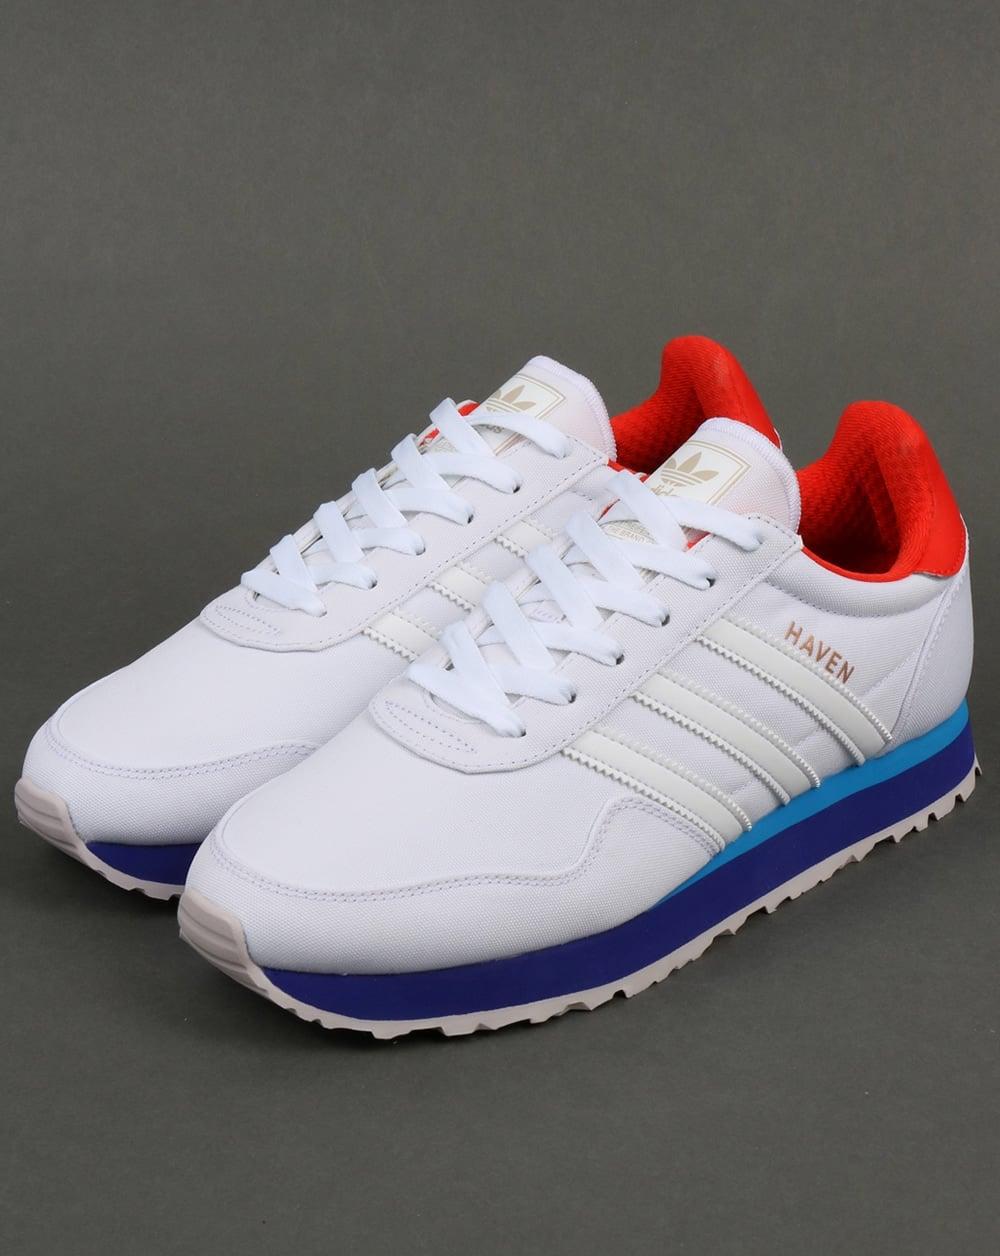 Adidas Originals Haven Trainers White